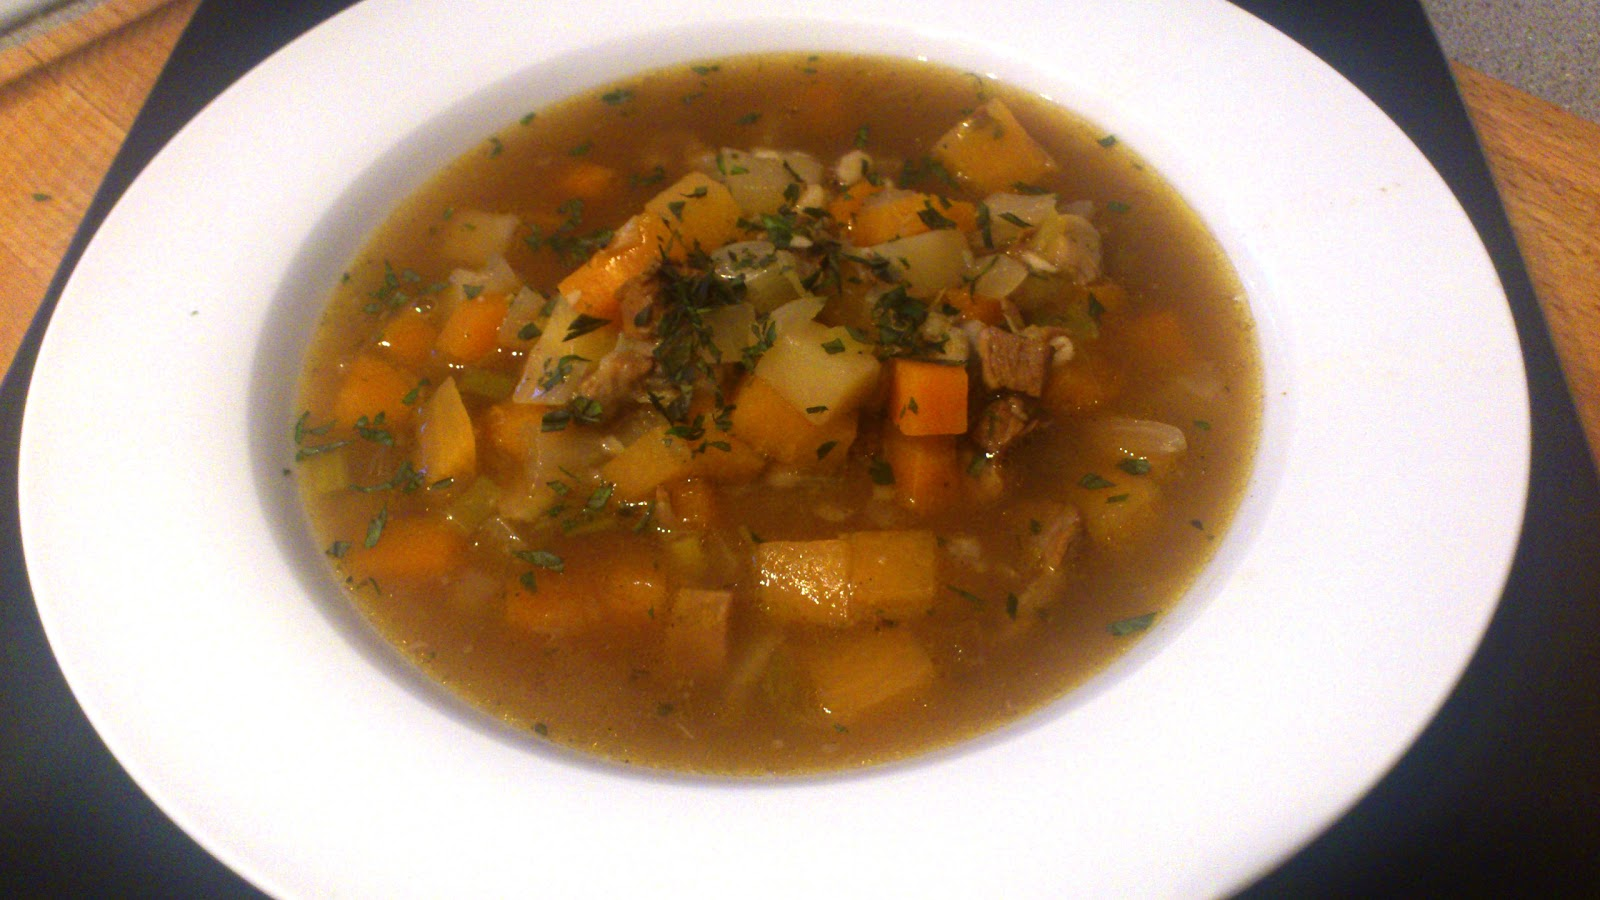 Soup Tuesday: Scotch Broth